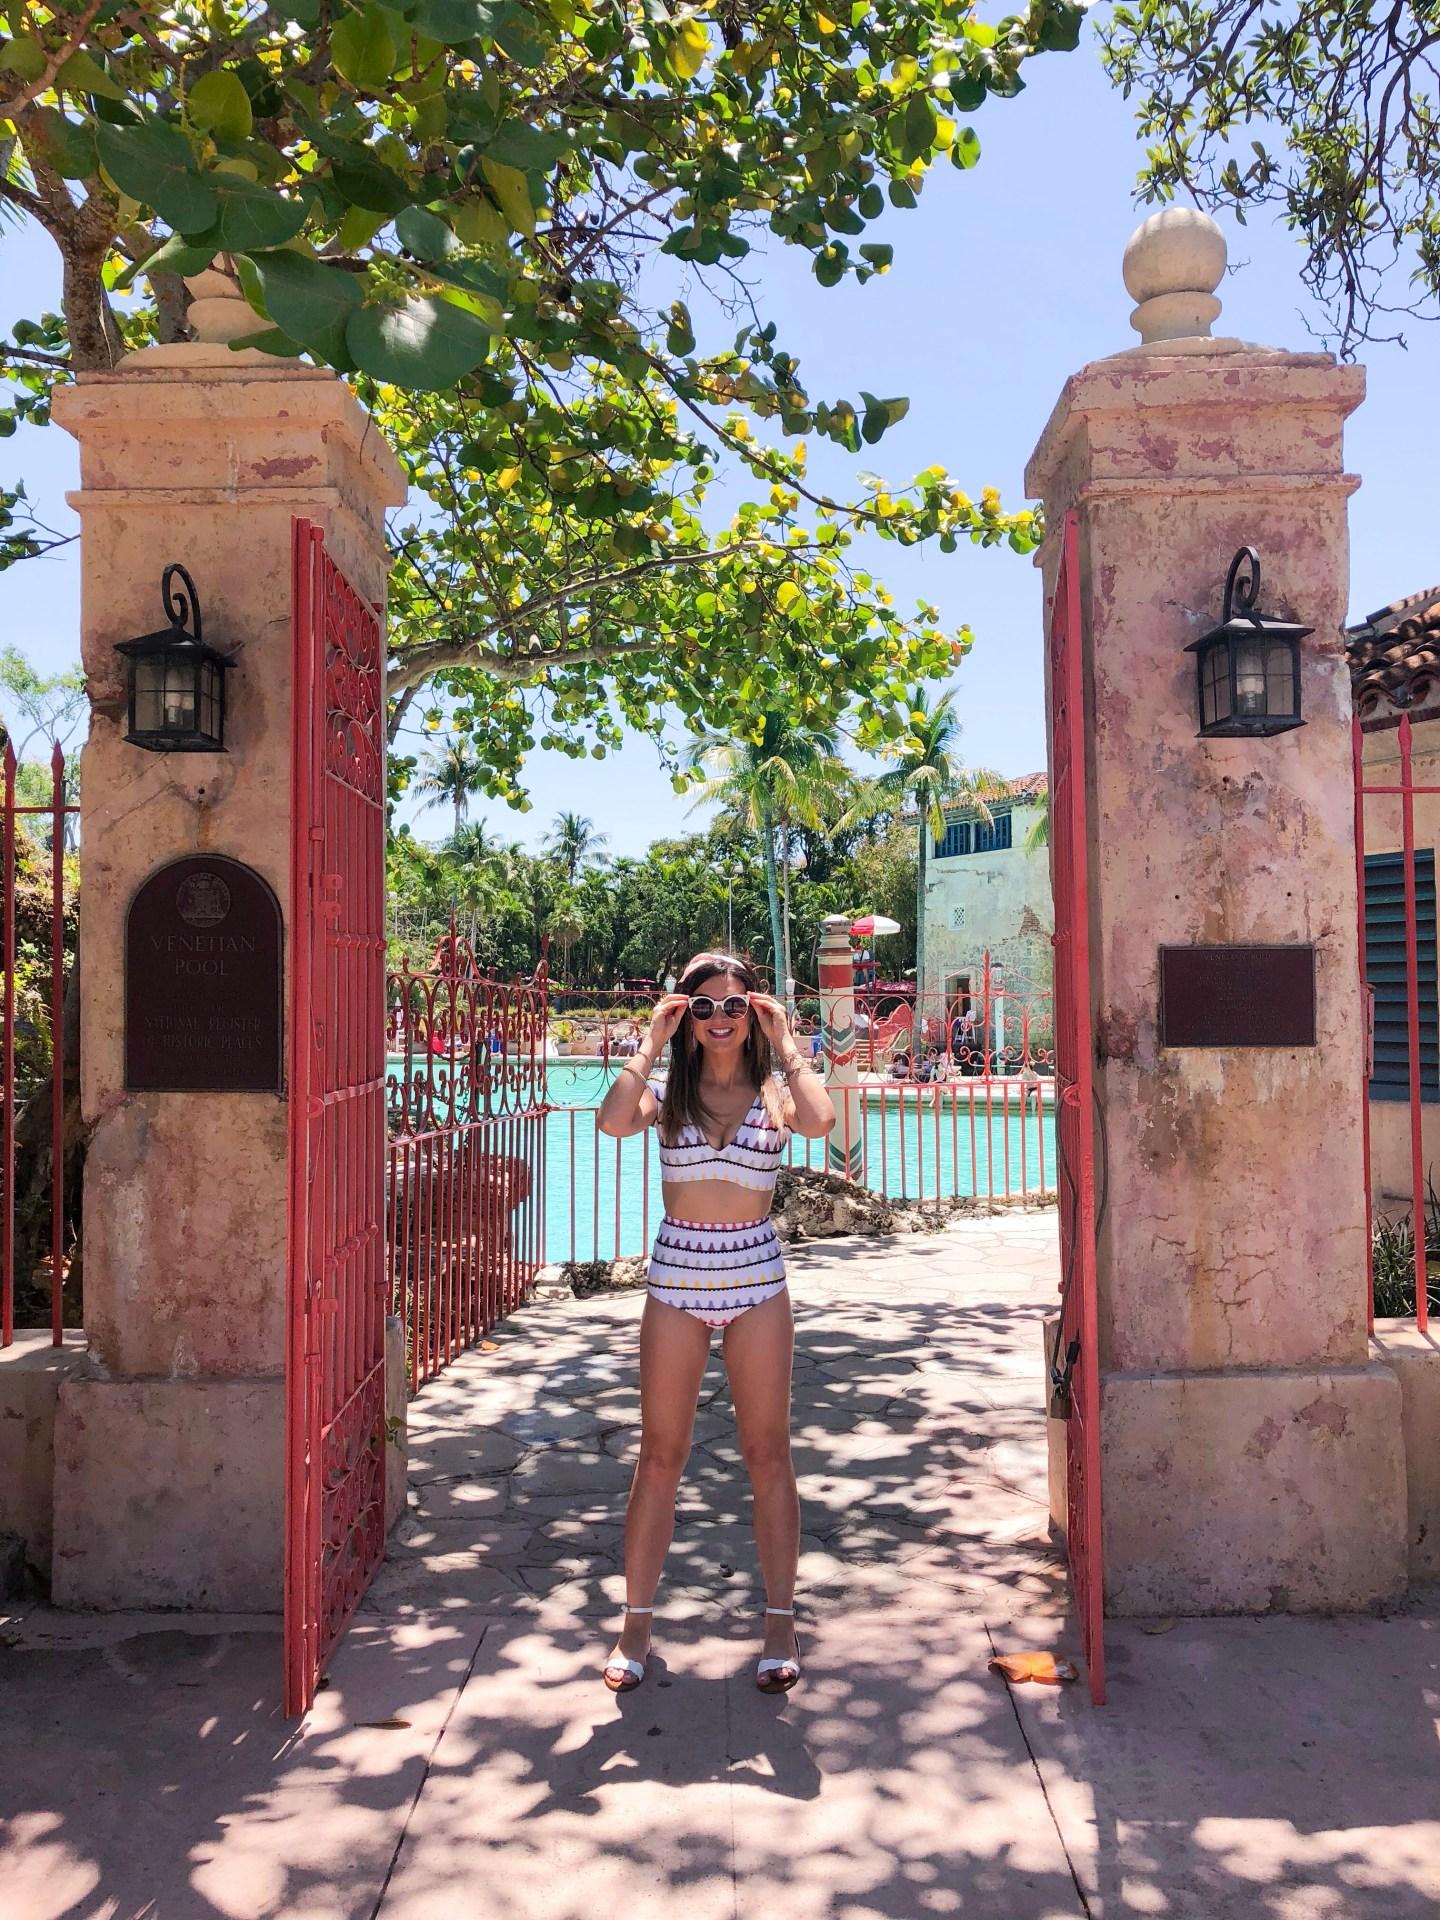 The Venetian Pool is One of Miami's Hidden Gems